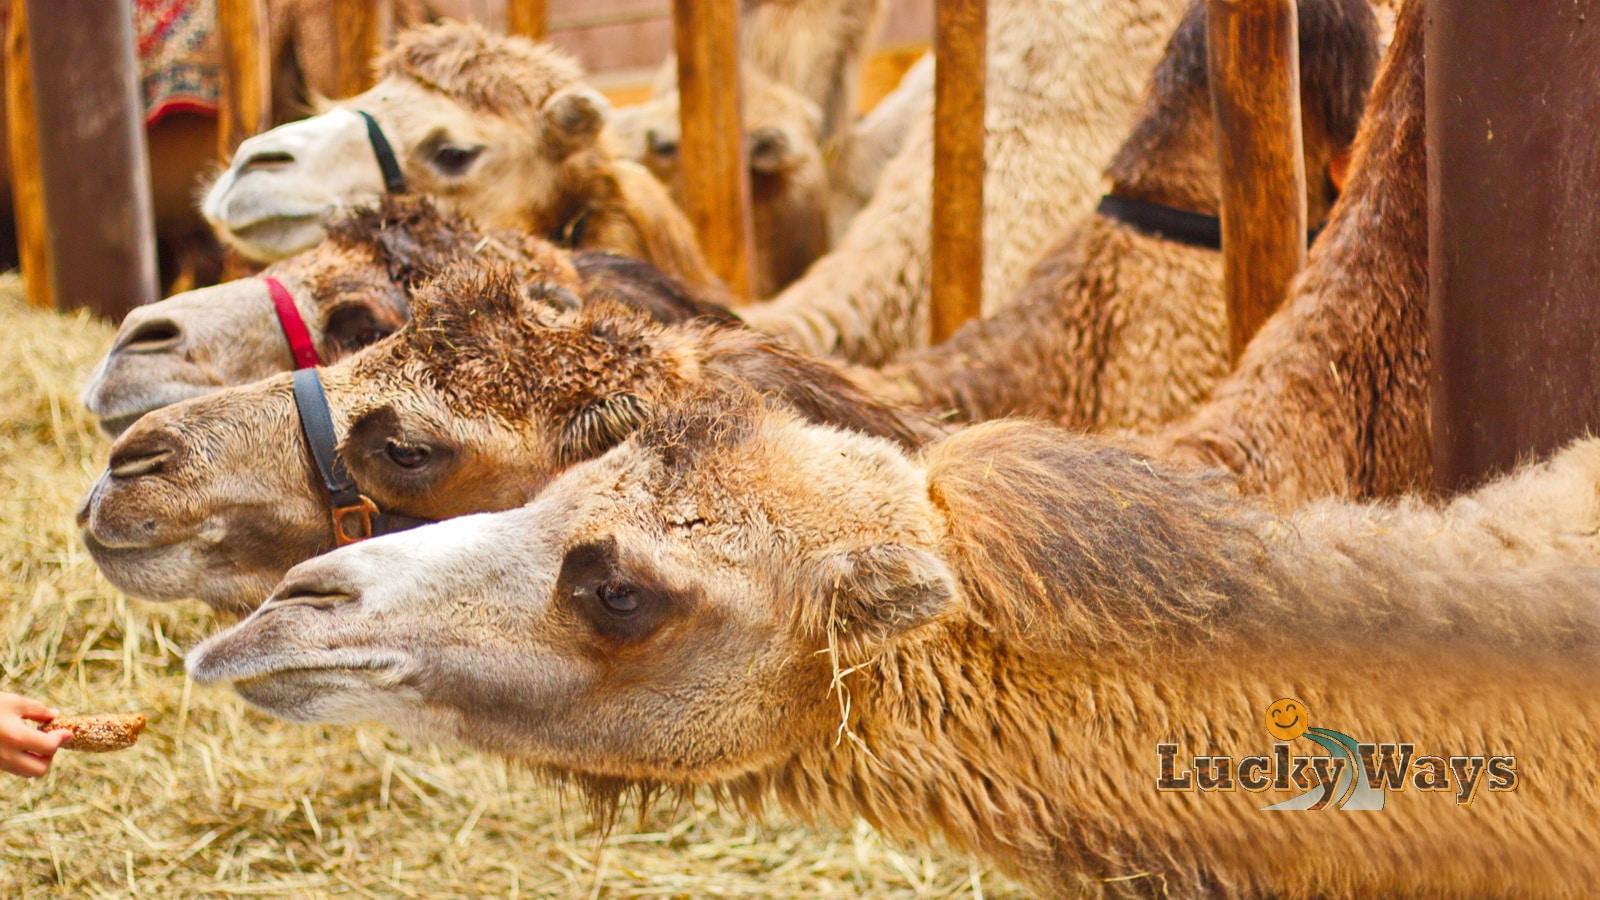 Globetrottertreffen 2017 Kamele im Stall bei Bayern-Kamele